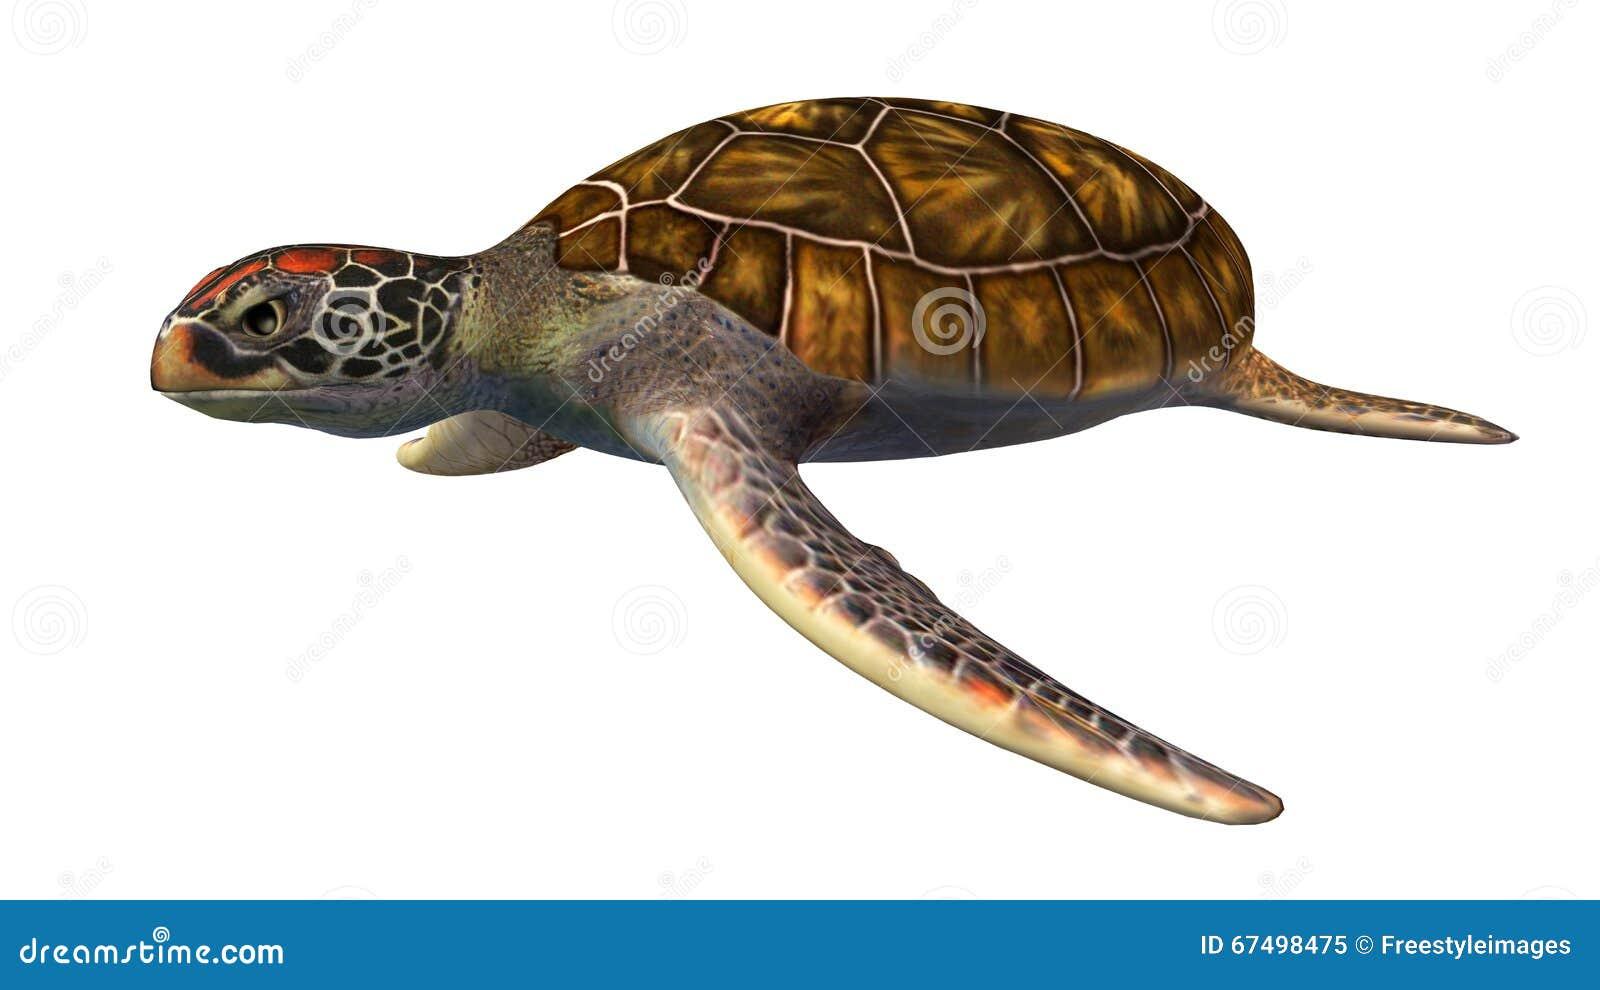 turtle white background - photo #38